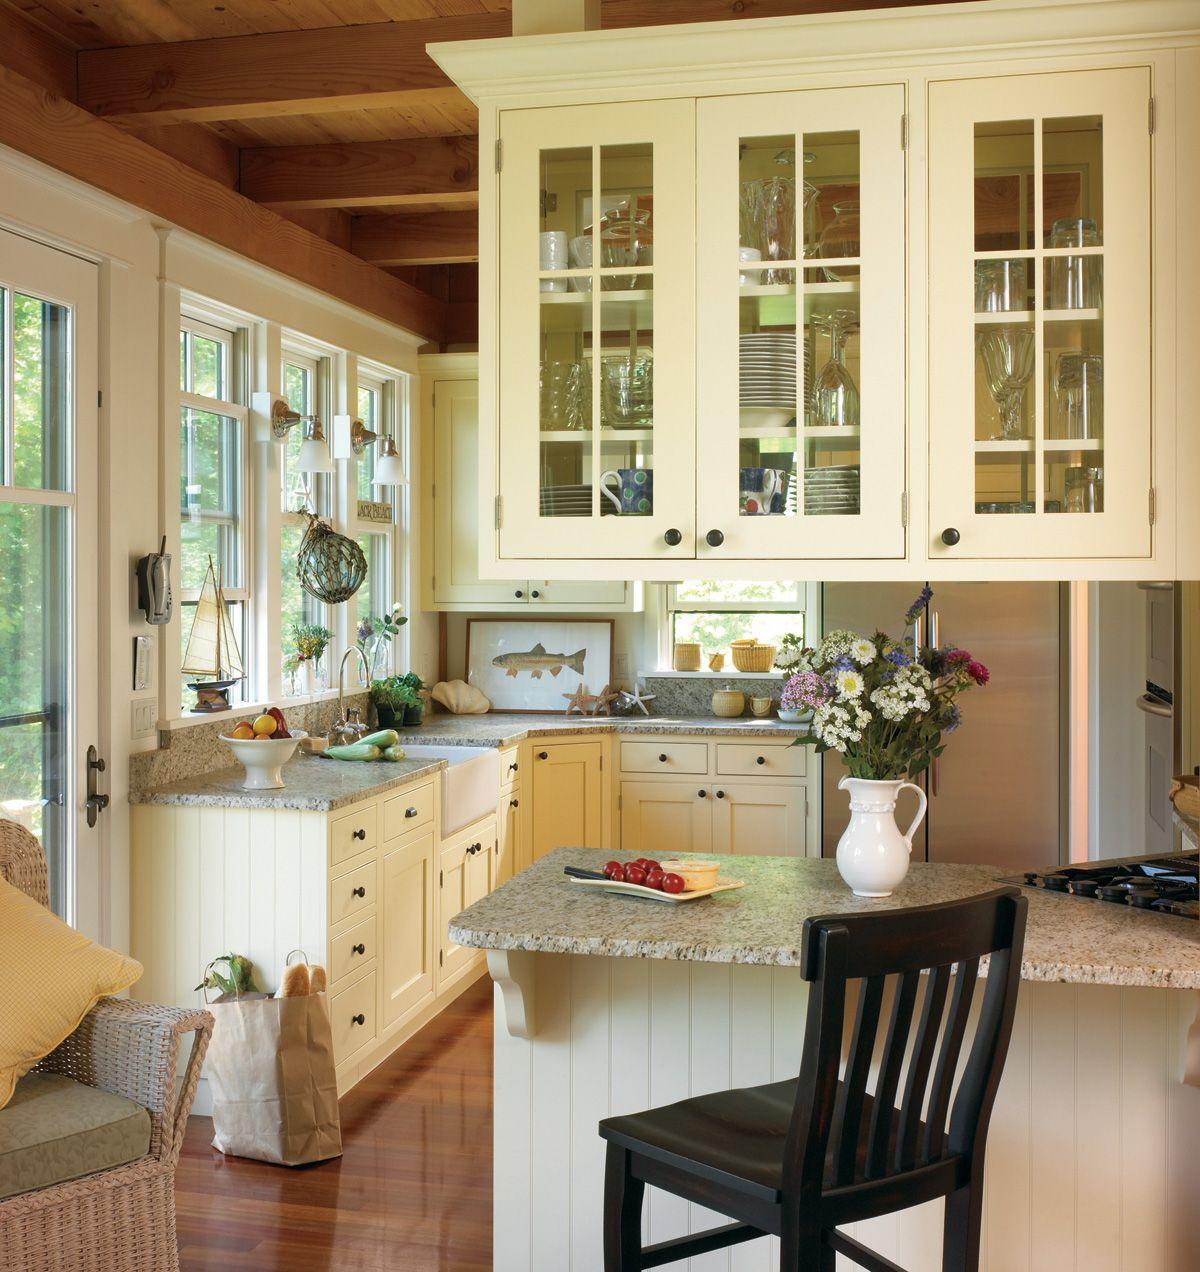 Medium Crop Of French Country Cottage Kitchen Designs